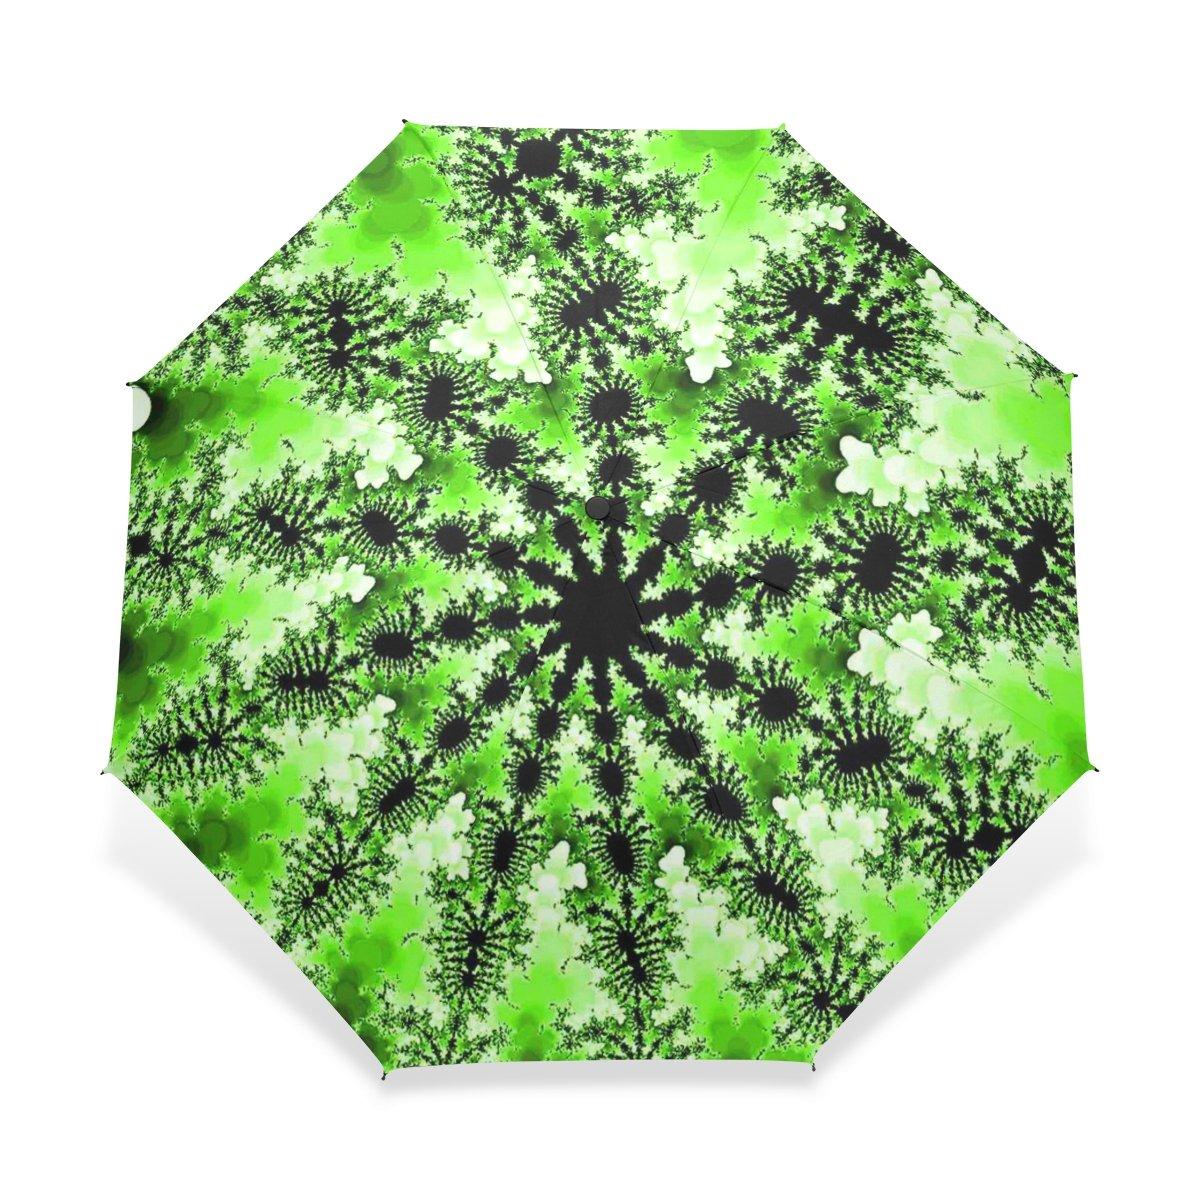 baihuishop防風ゴルフ傘、コンパクトで旅行for Easy Carryingスポーツ雨傘 – 強力なフレームUnbreakableライムグリーンMandelbrotフラクタルパターン   B01FQJIBNM